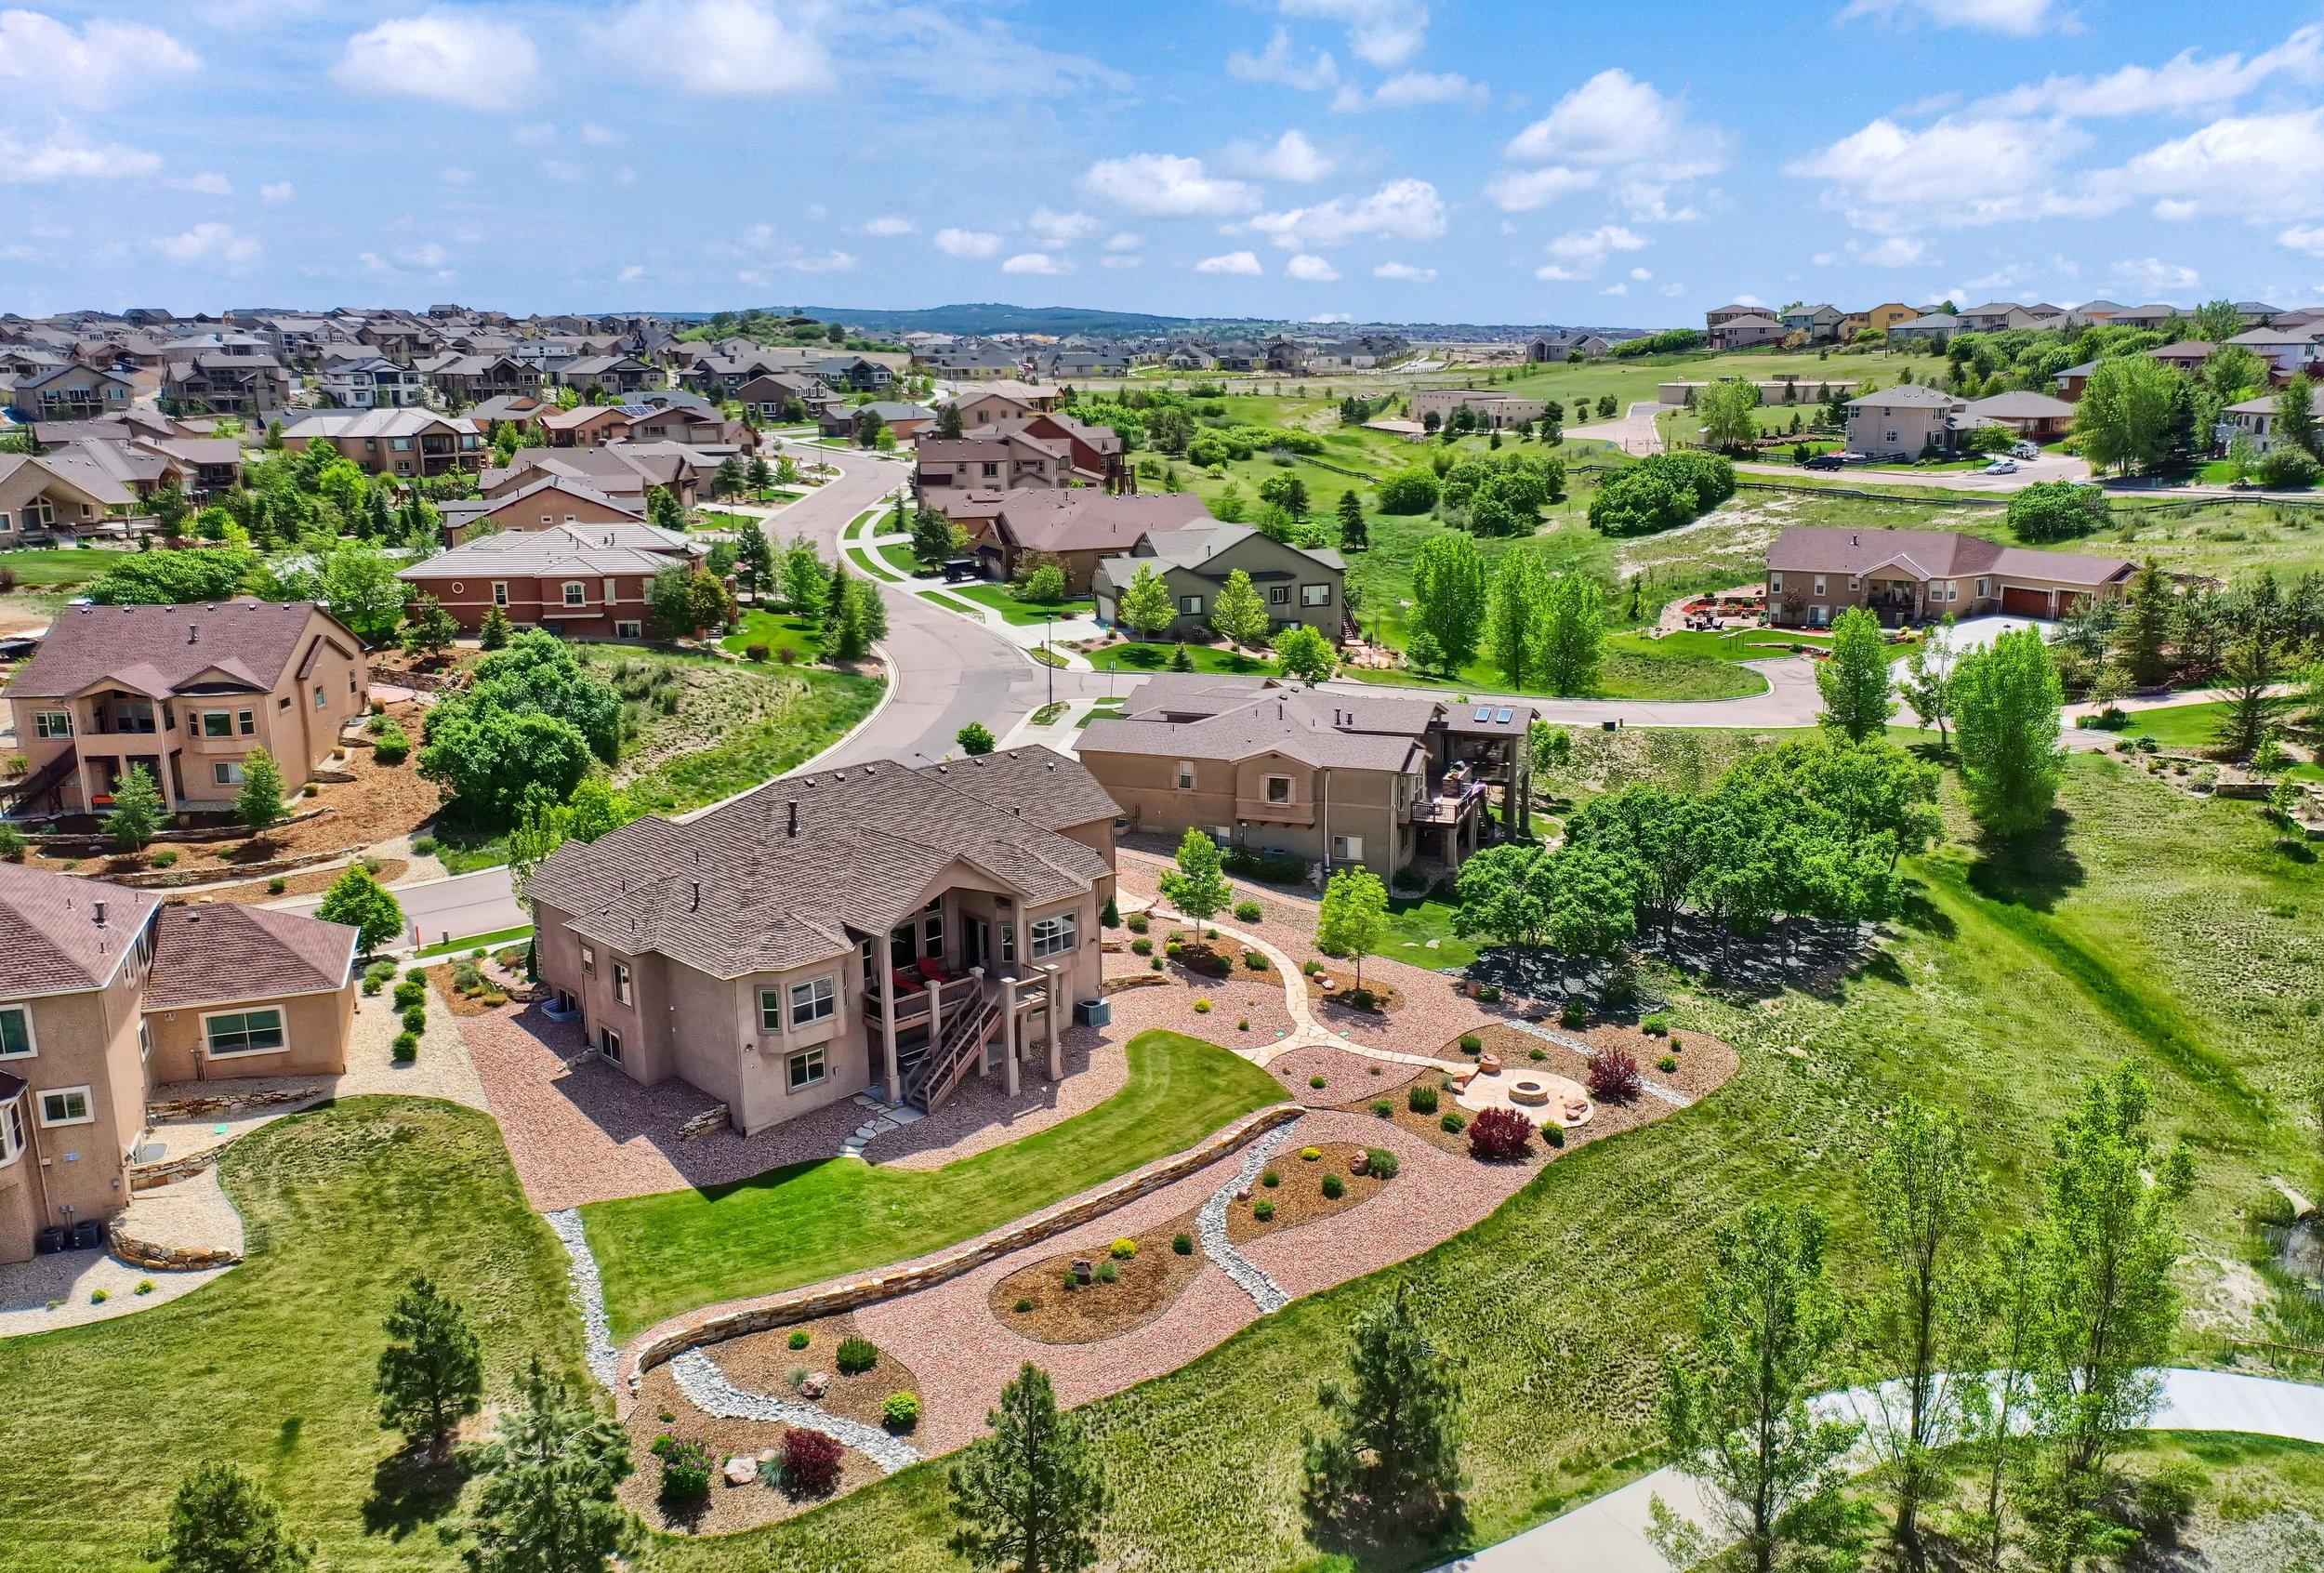 12496 Creekhurst Dr Colorado-print-008-033-Aerial-4200x2844-300dpi.jpg